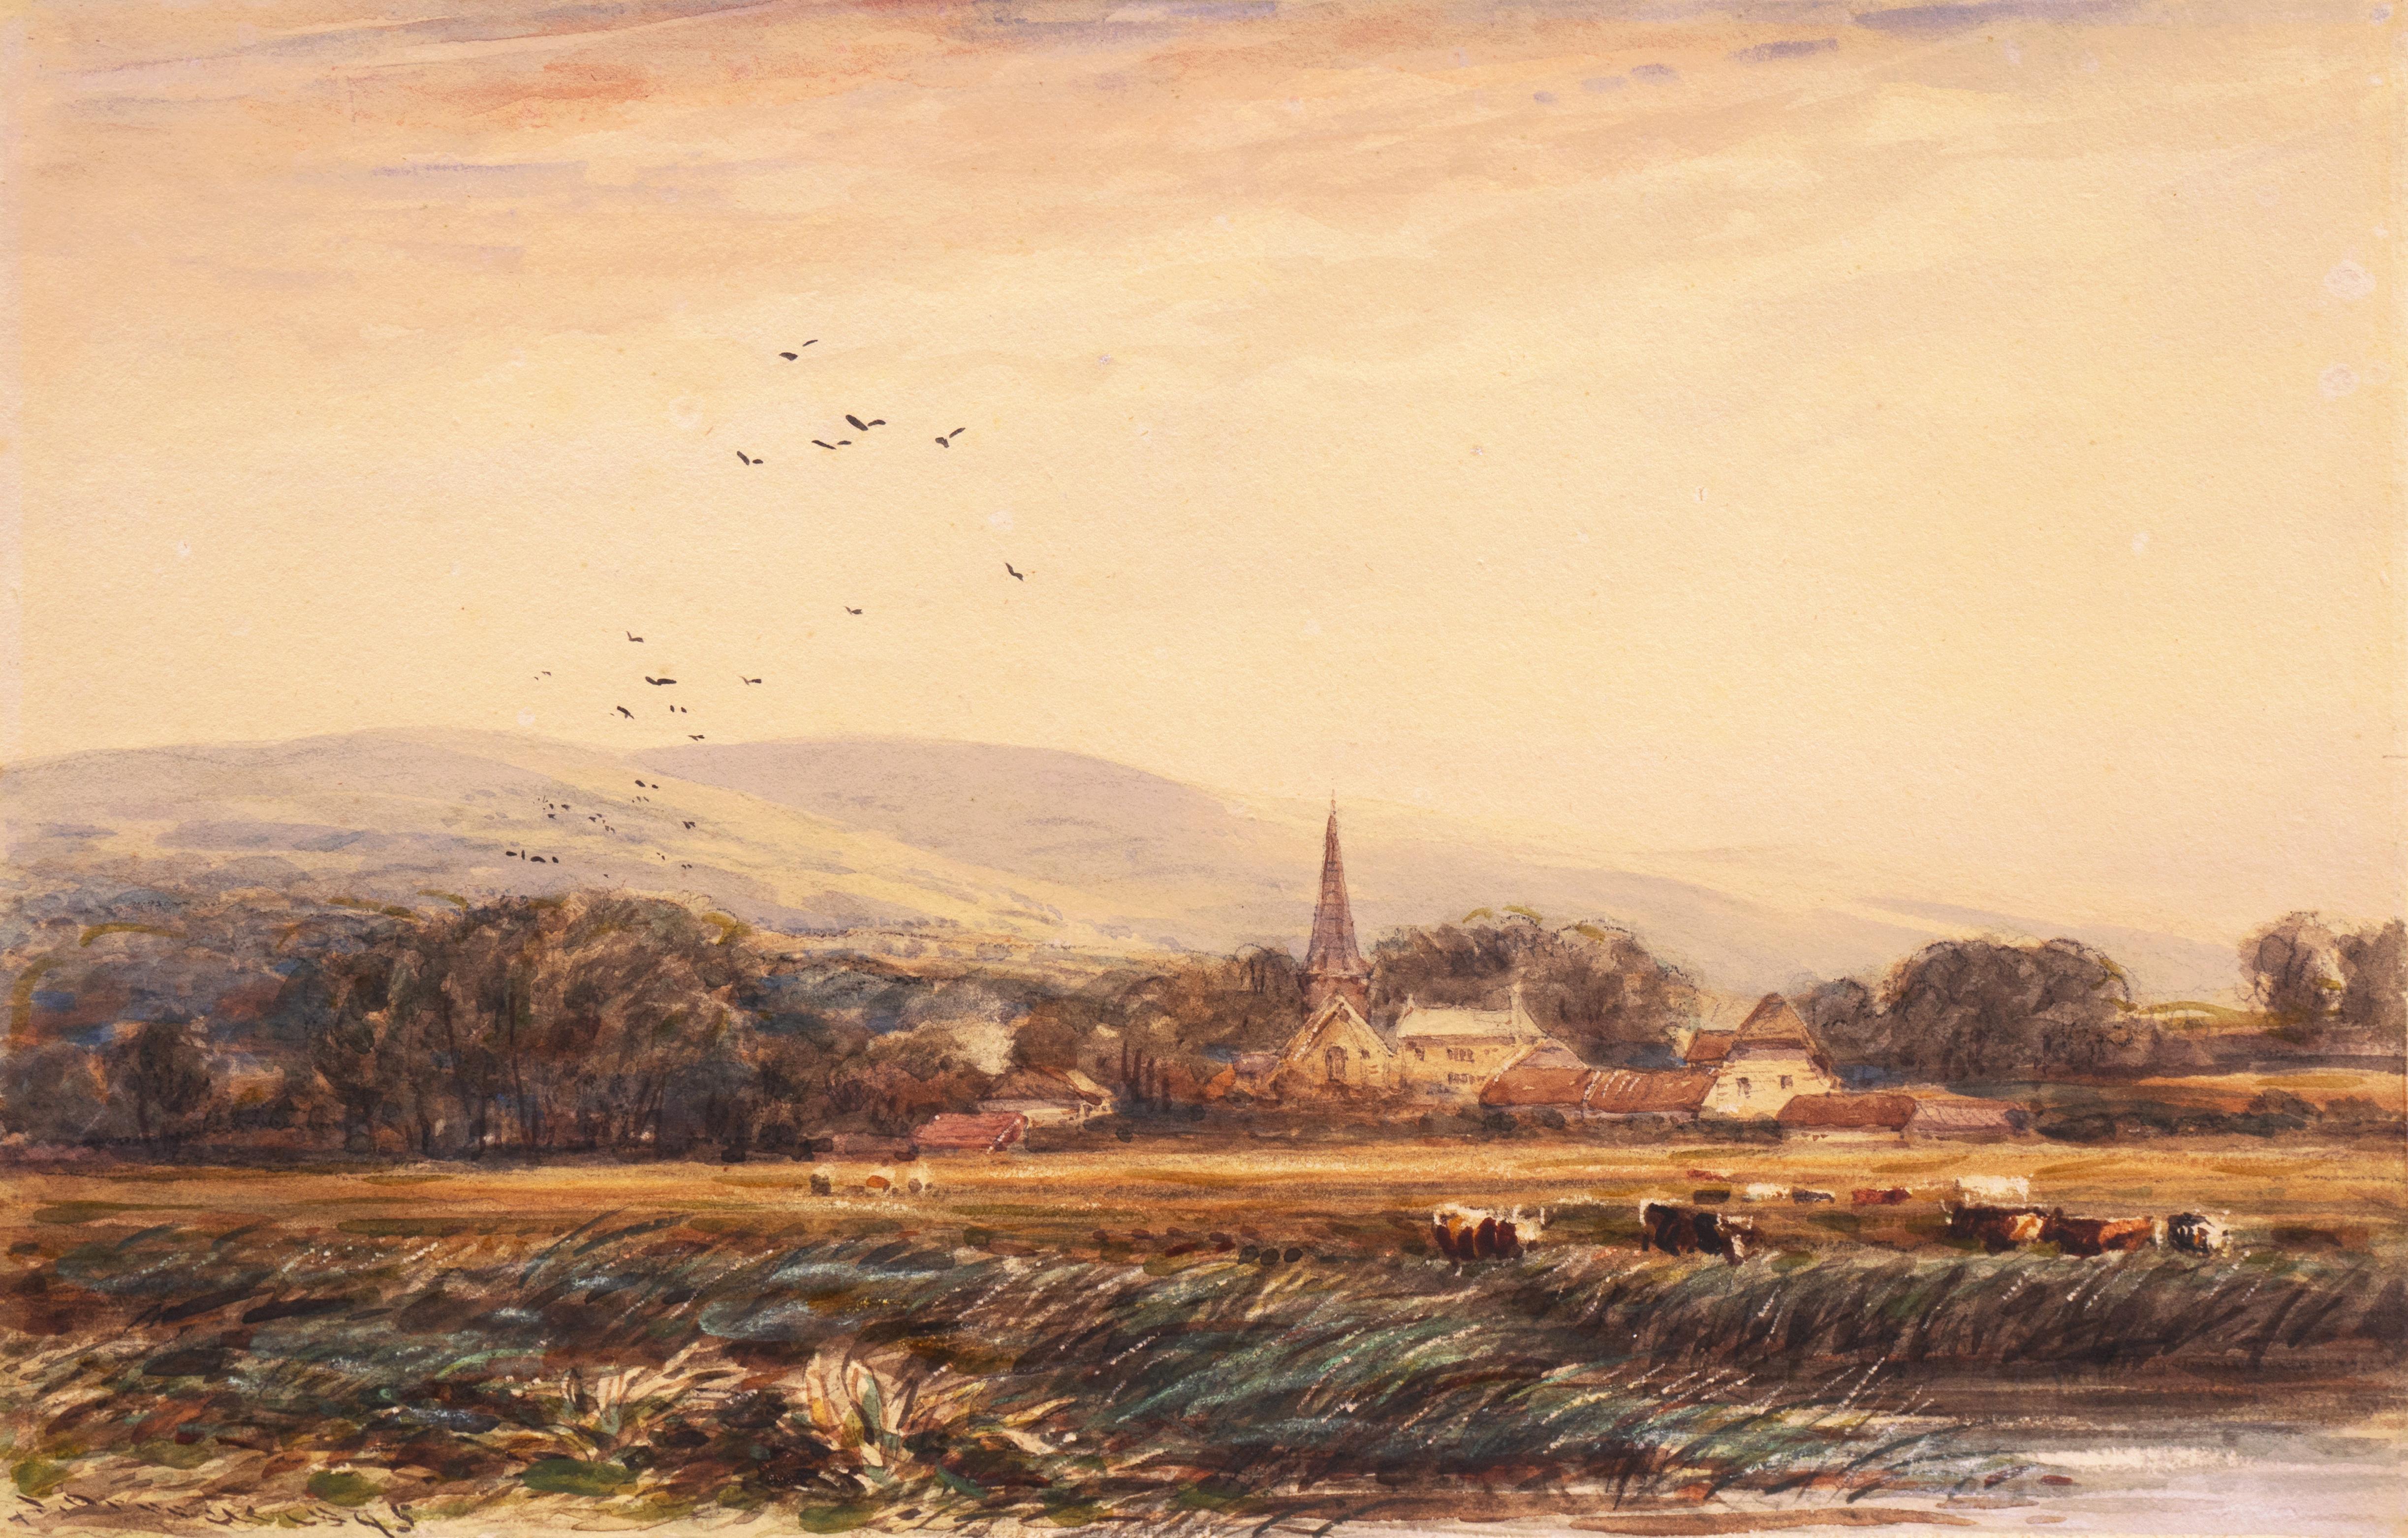 'Village with Church Spire', English mid-19th Century Watercolor, David Cox